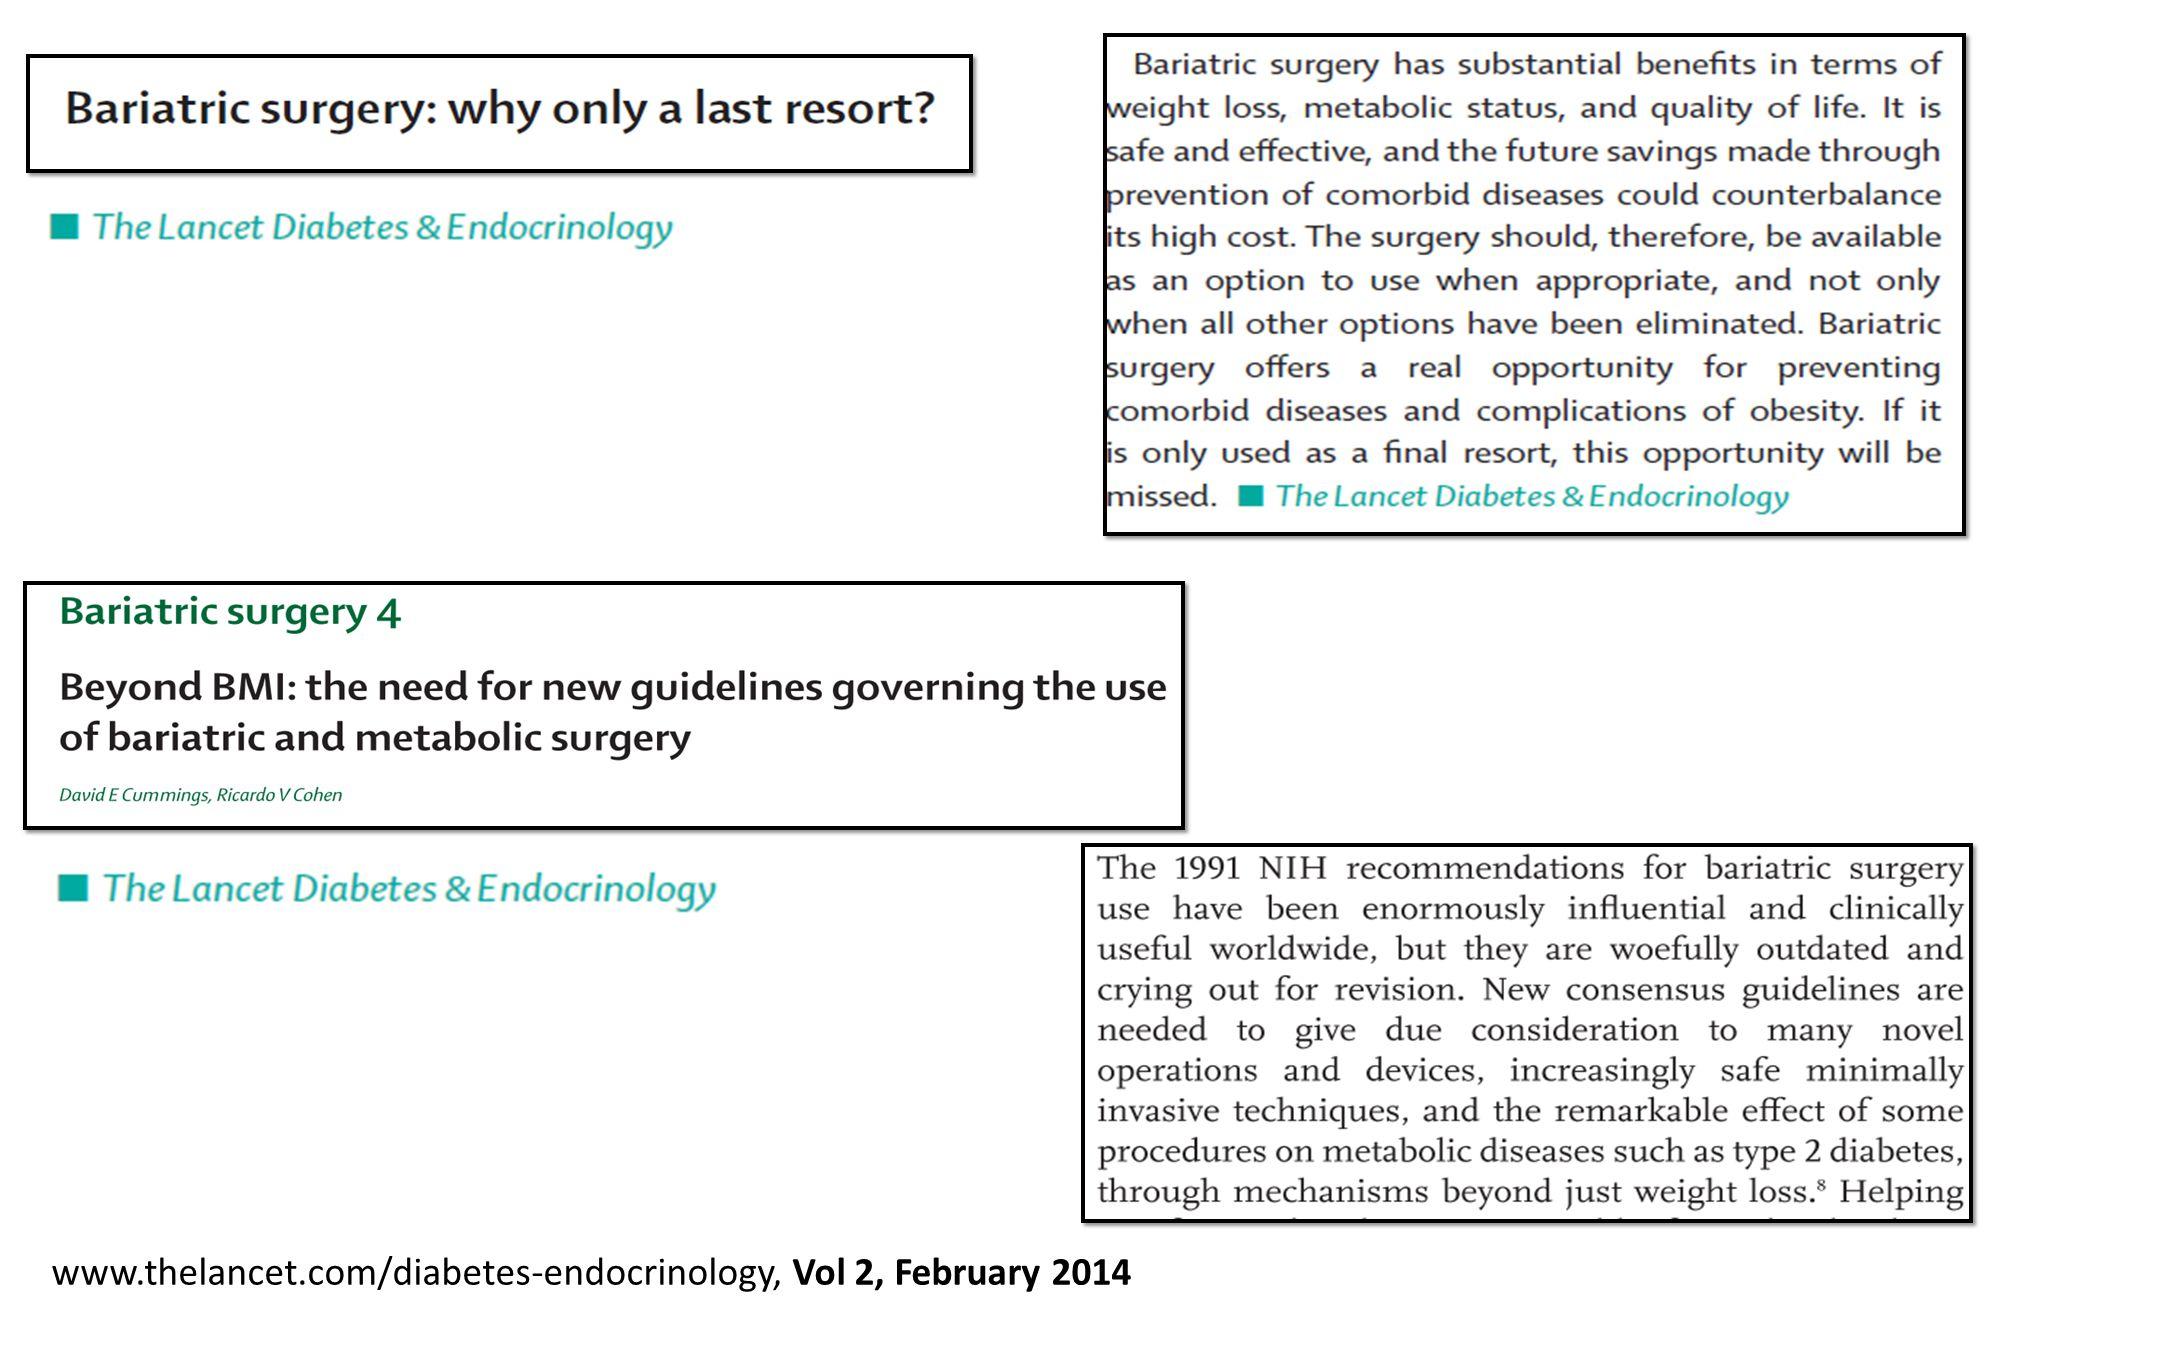 www.thelancet.com/diabetes-endocrinology, Vol 2, February 2014